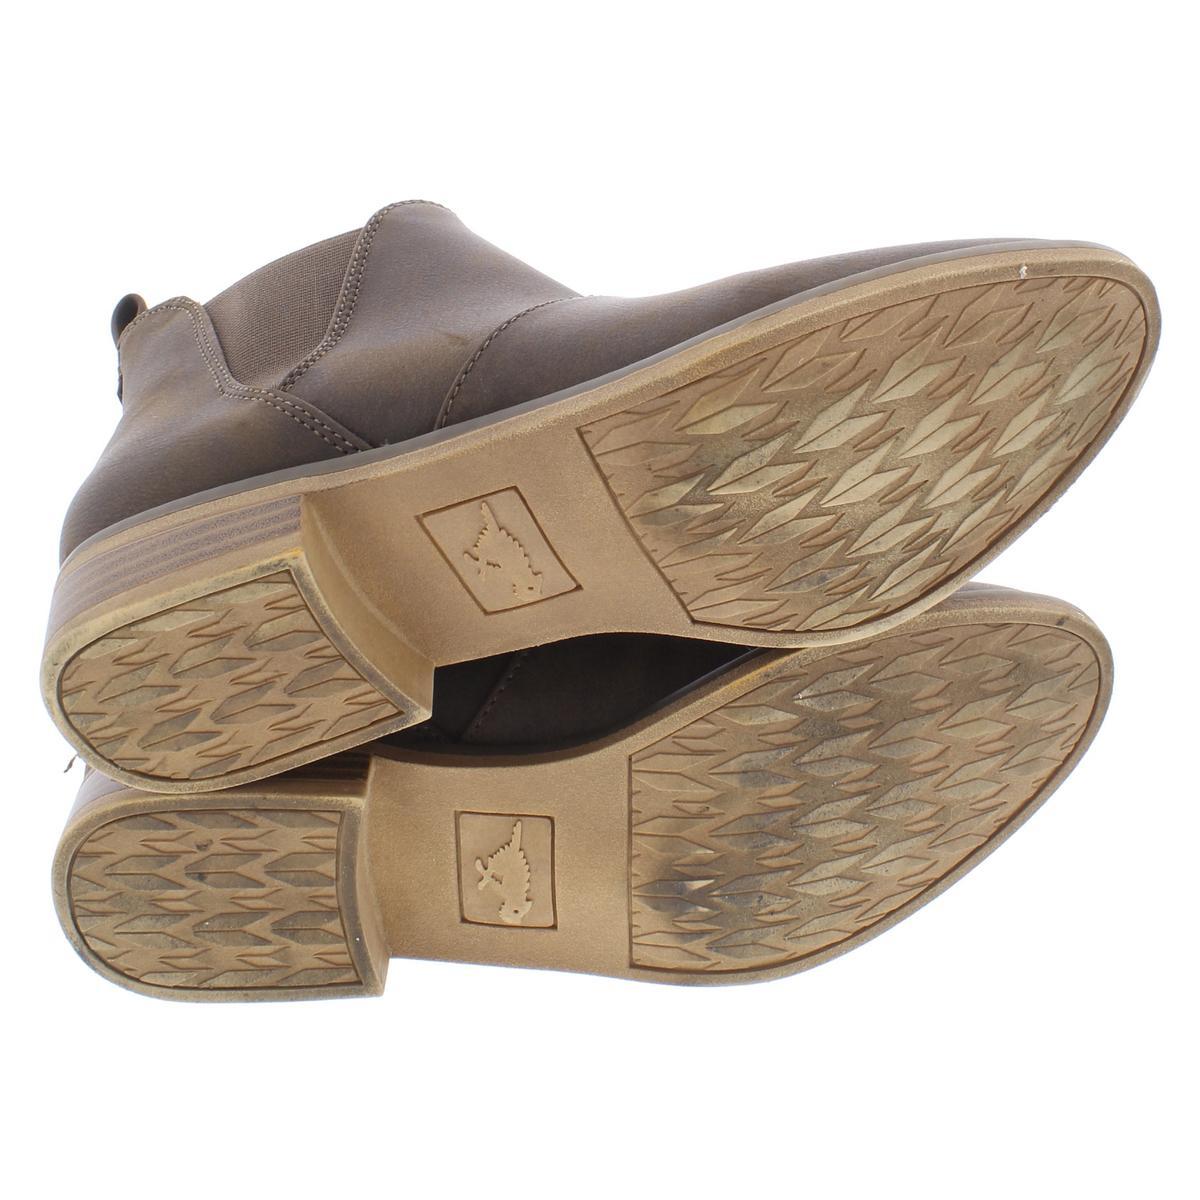 1078c7eeca671 Rocket Dog Womens Maylon Brown Chelsea Boots Shoes 8 Medium (B,M ...